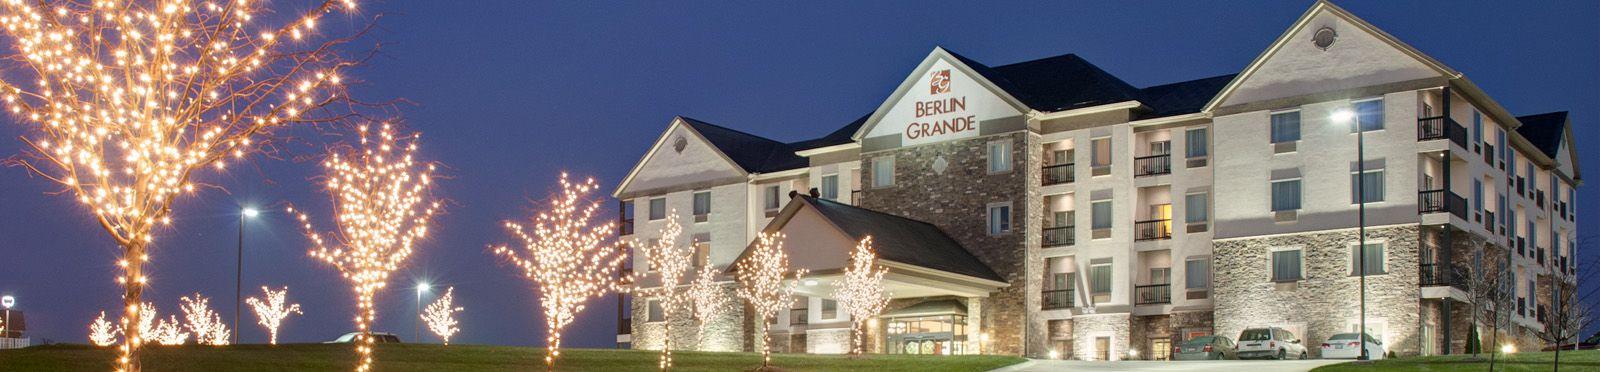 Berlin Grande Hotel In Ohio Ohioholmes Countyboutique